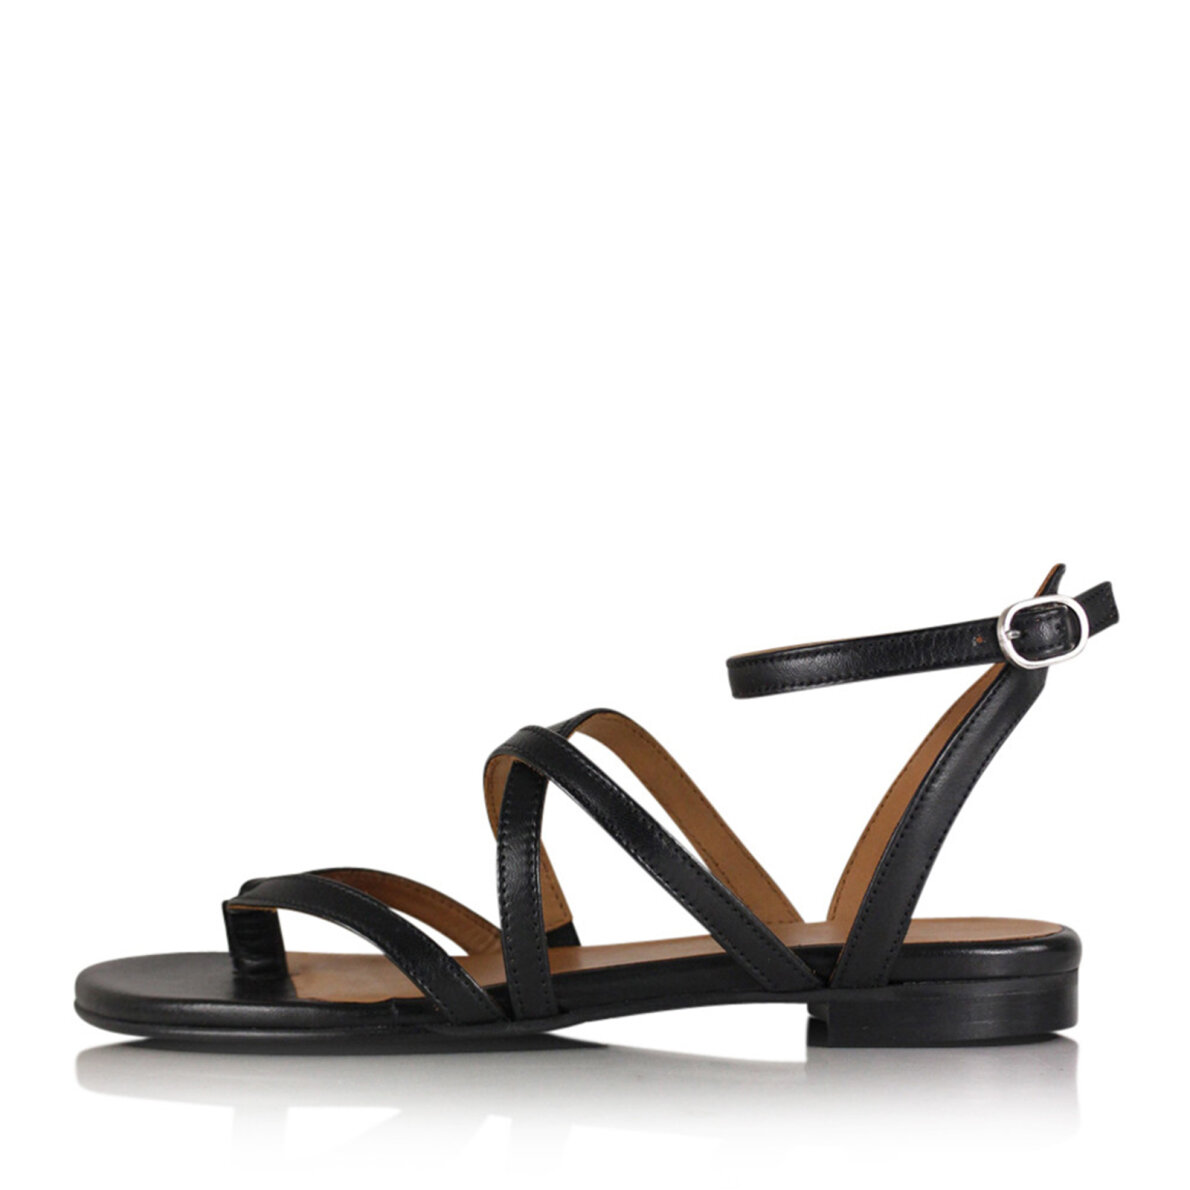 62b00b6722eb Billi Bi - Billi Bi 8706 sort dame sandal med krydsende remme ...